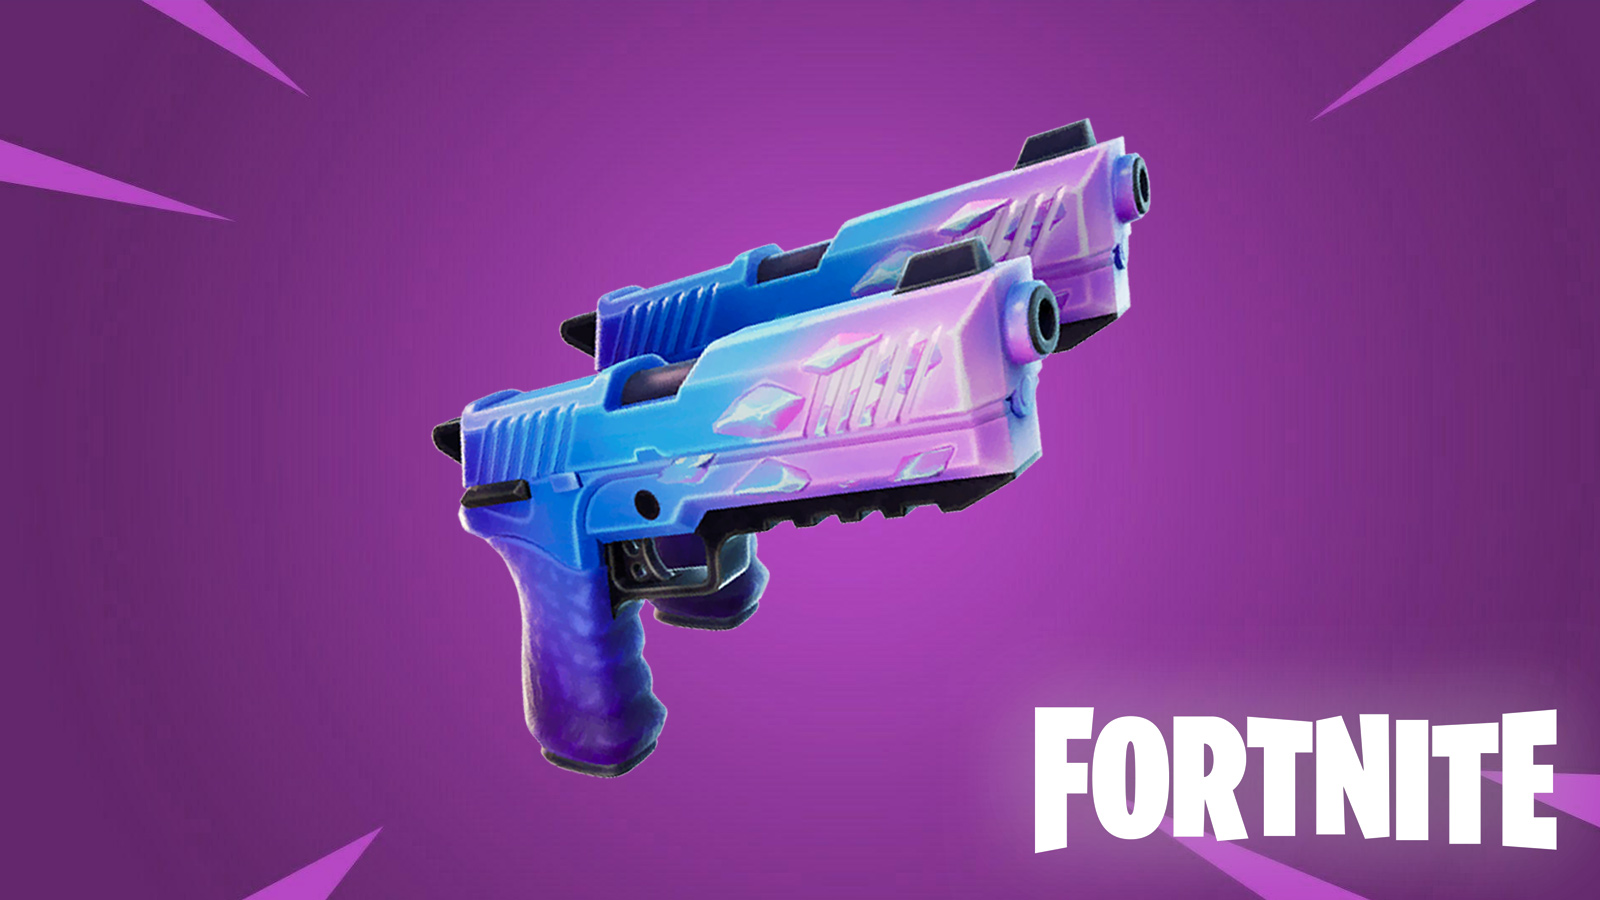 Fortnite Hop Rock Dualies exotic weapon